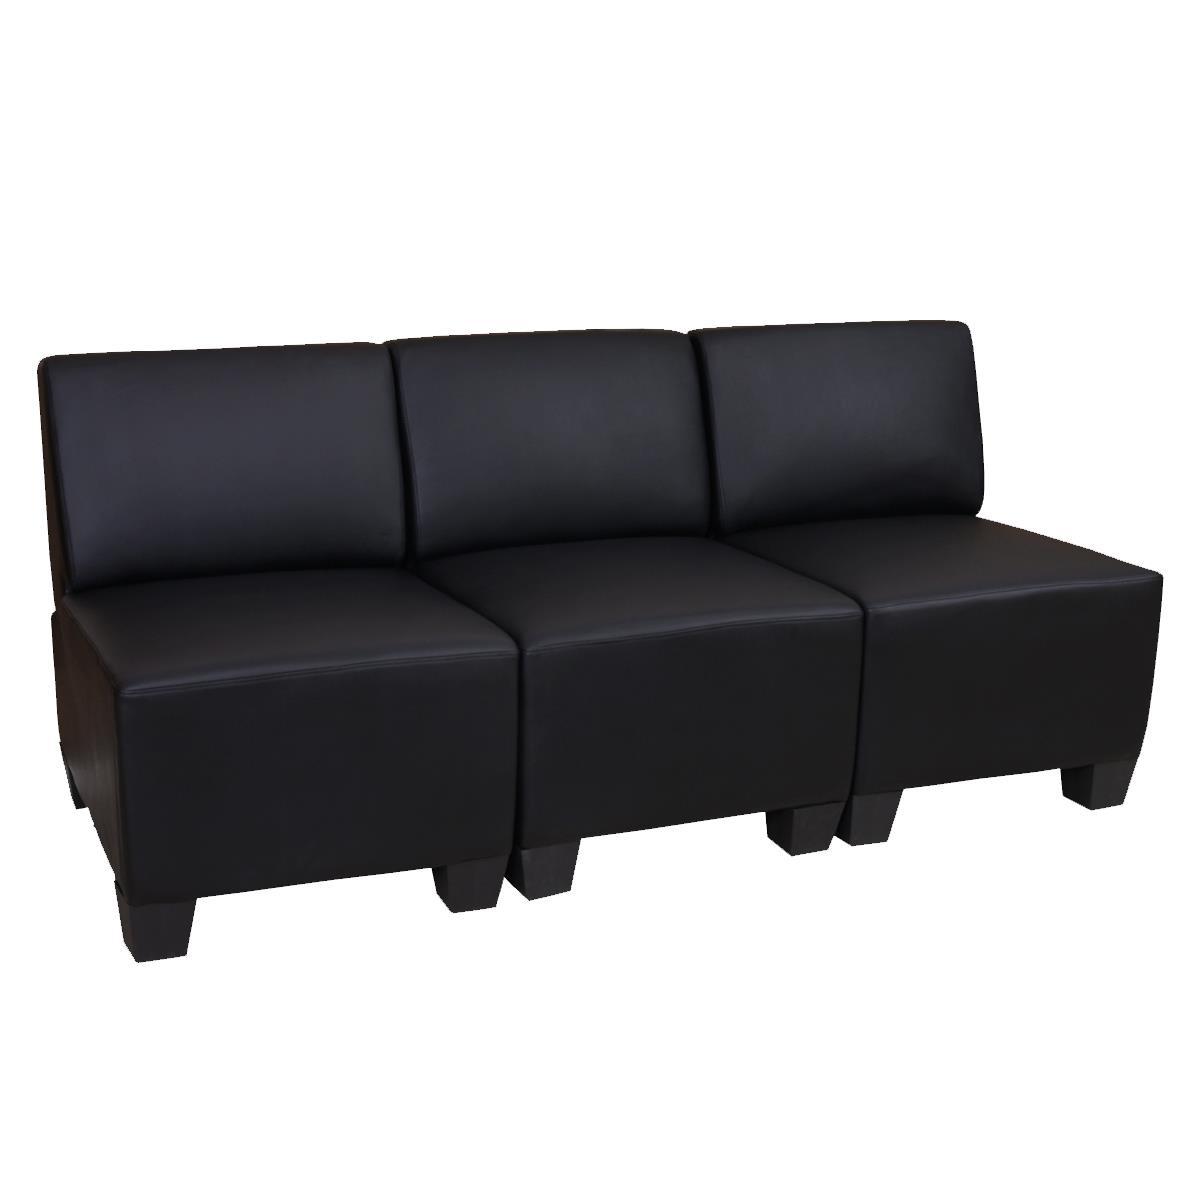 Divano modulare 3 posti lyon design moderno comodo in - Divano modulare ...